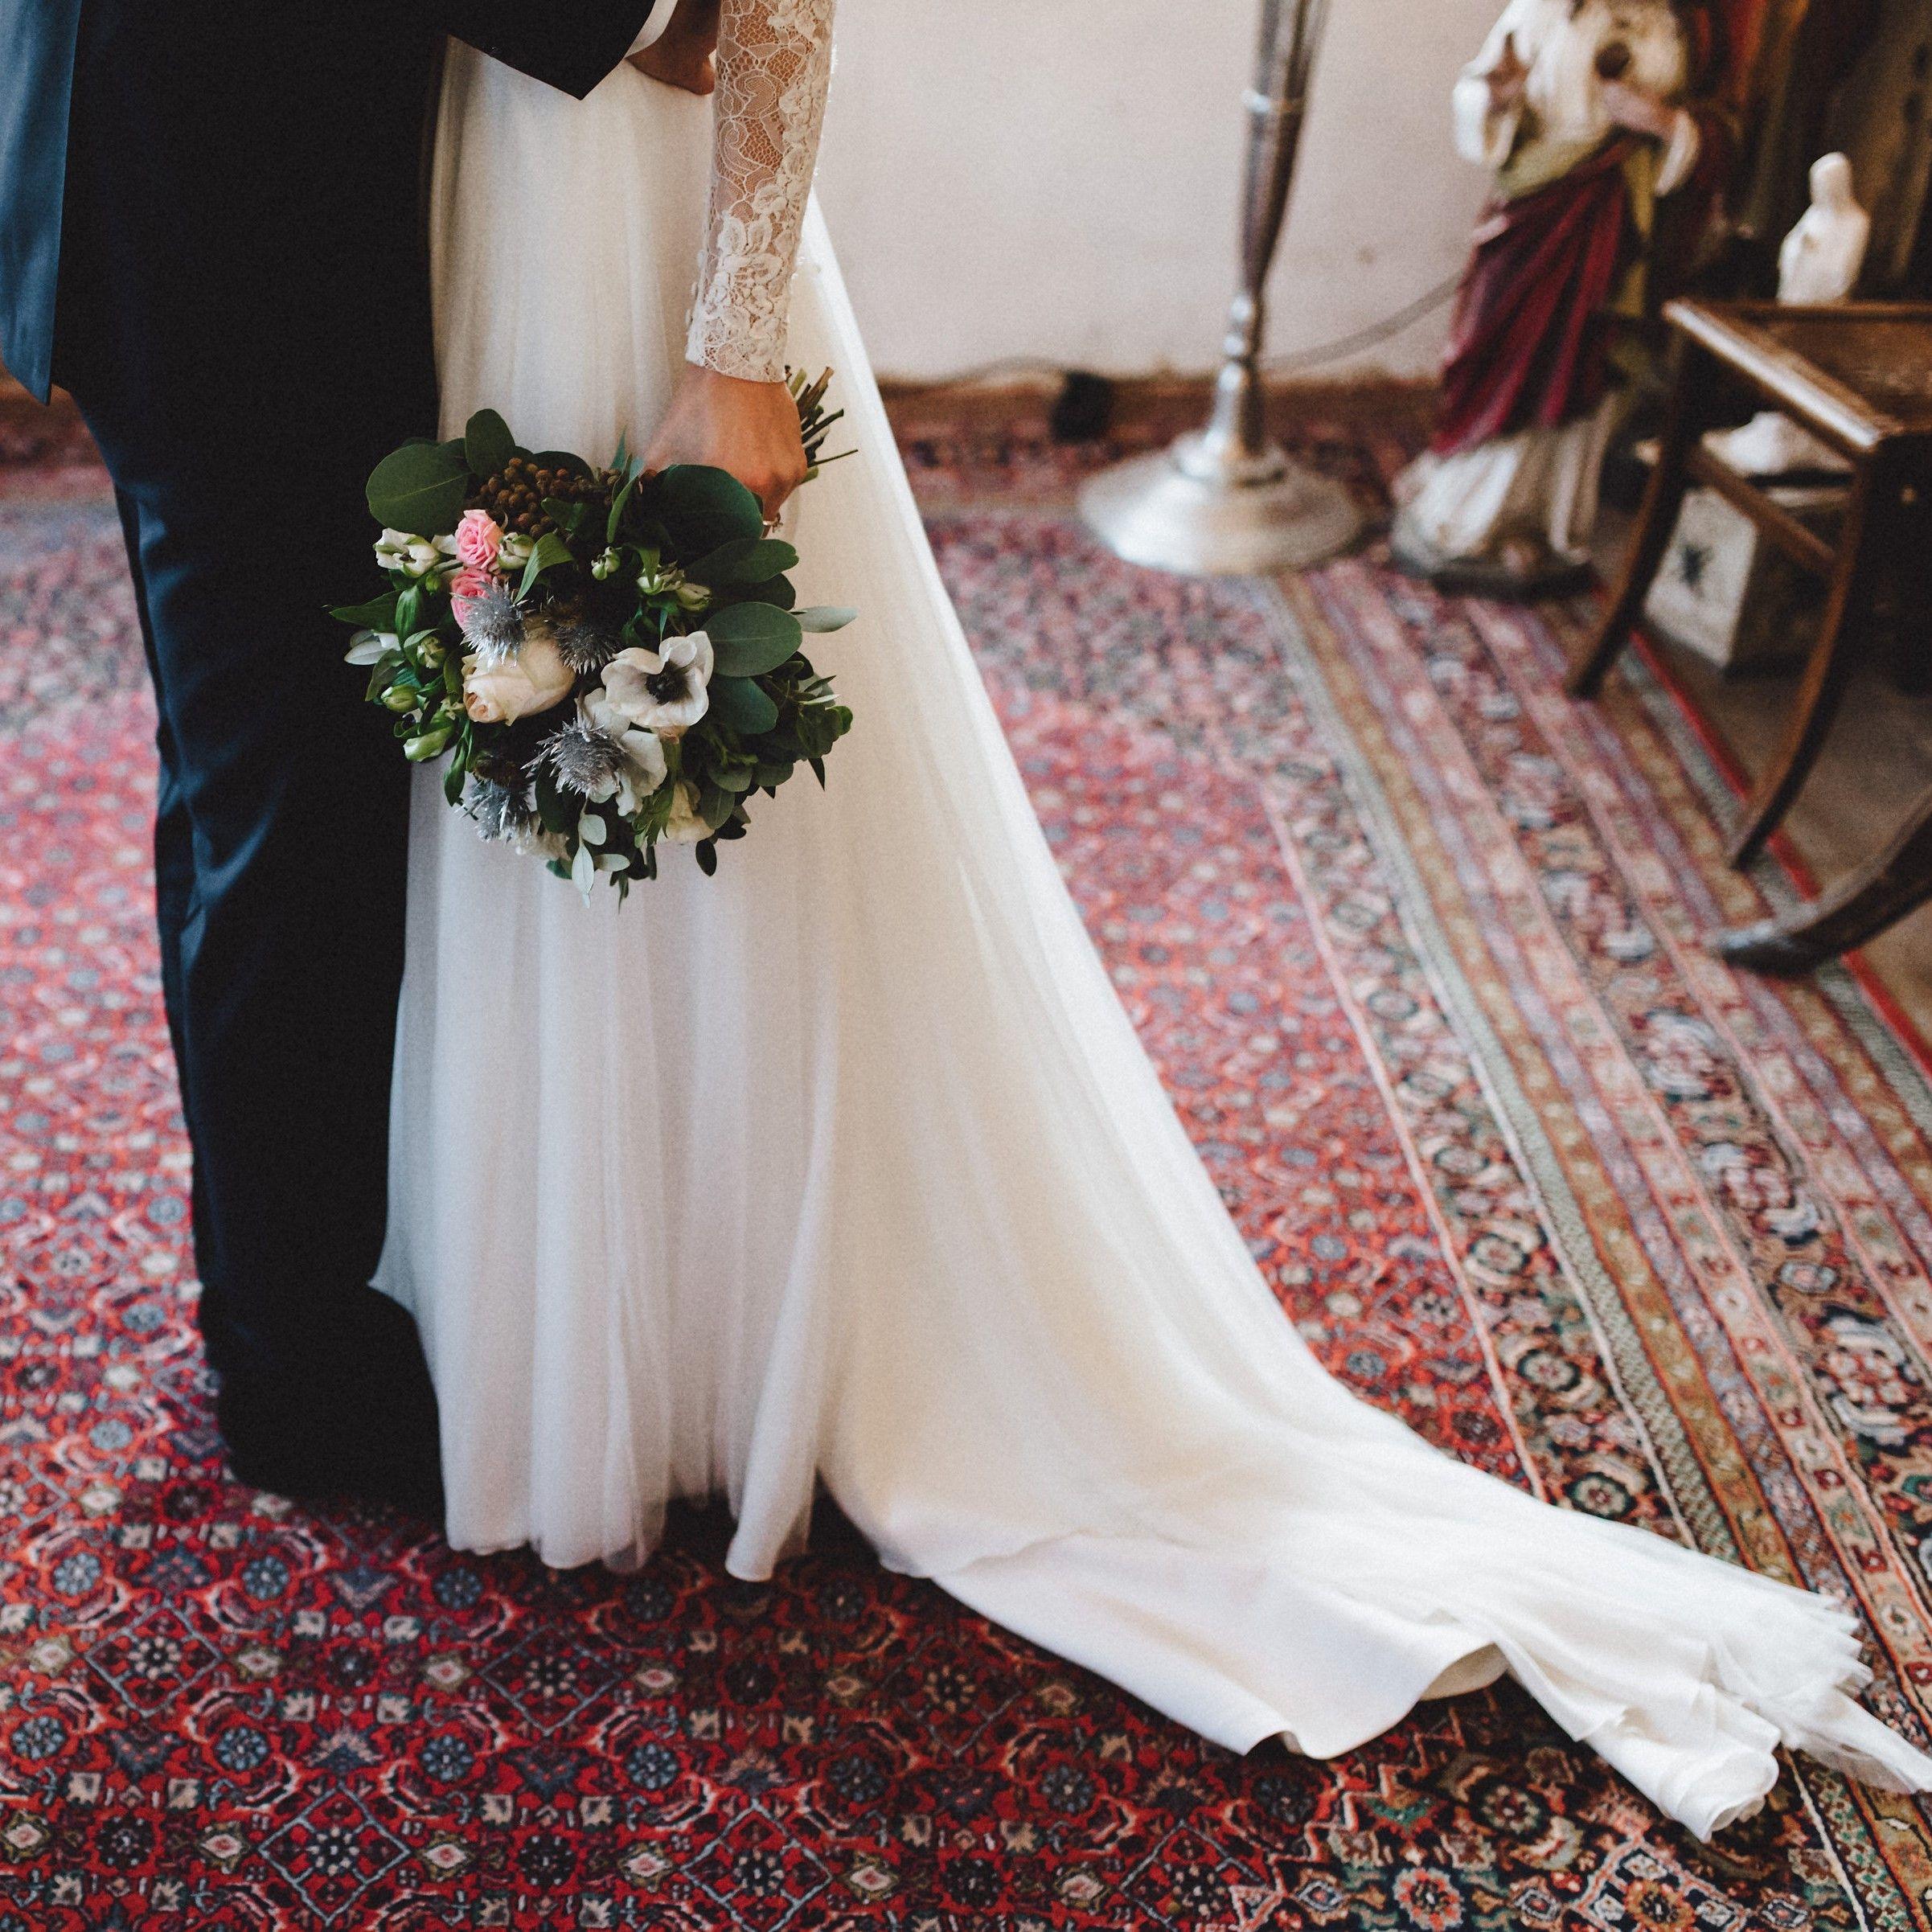 Wedding Dress: Jesus Peiro Wedding Couple: Mirja & Oliver Picture